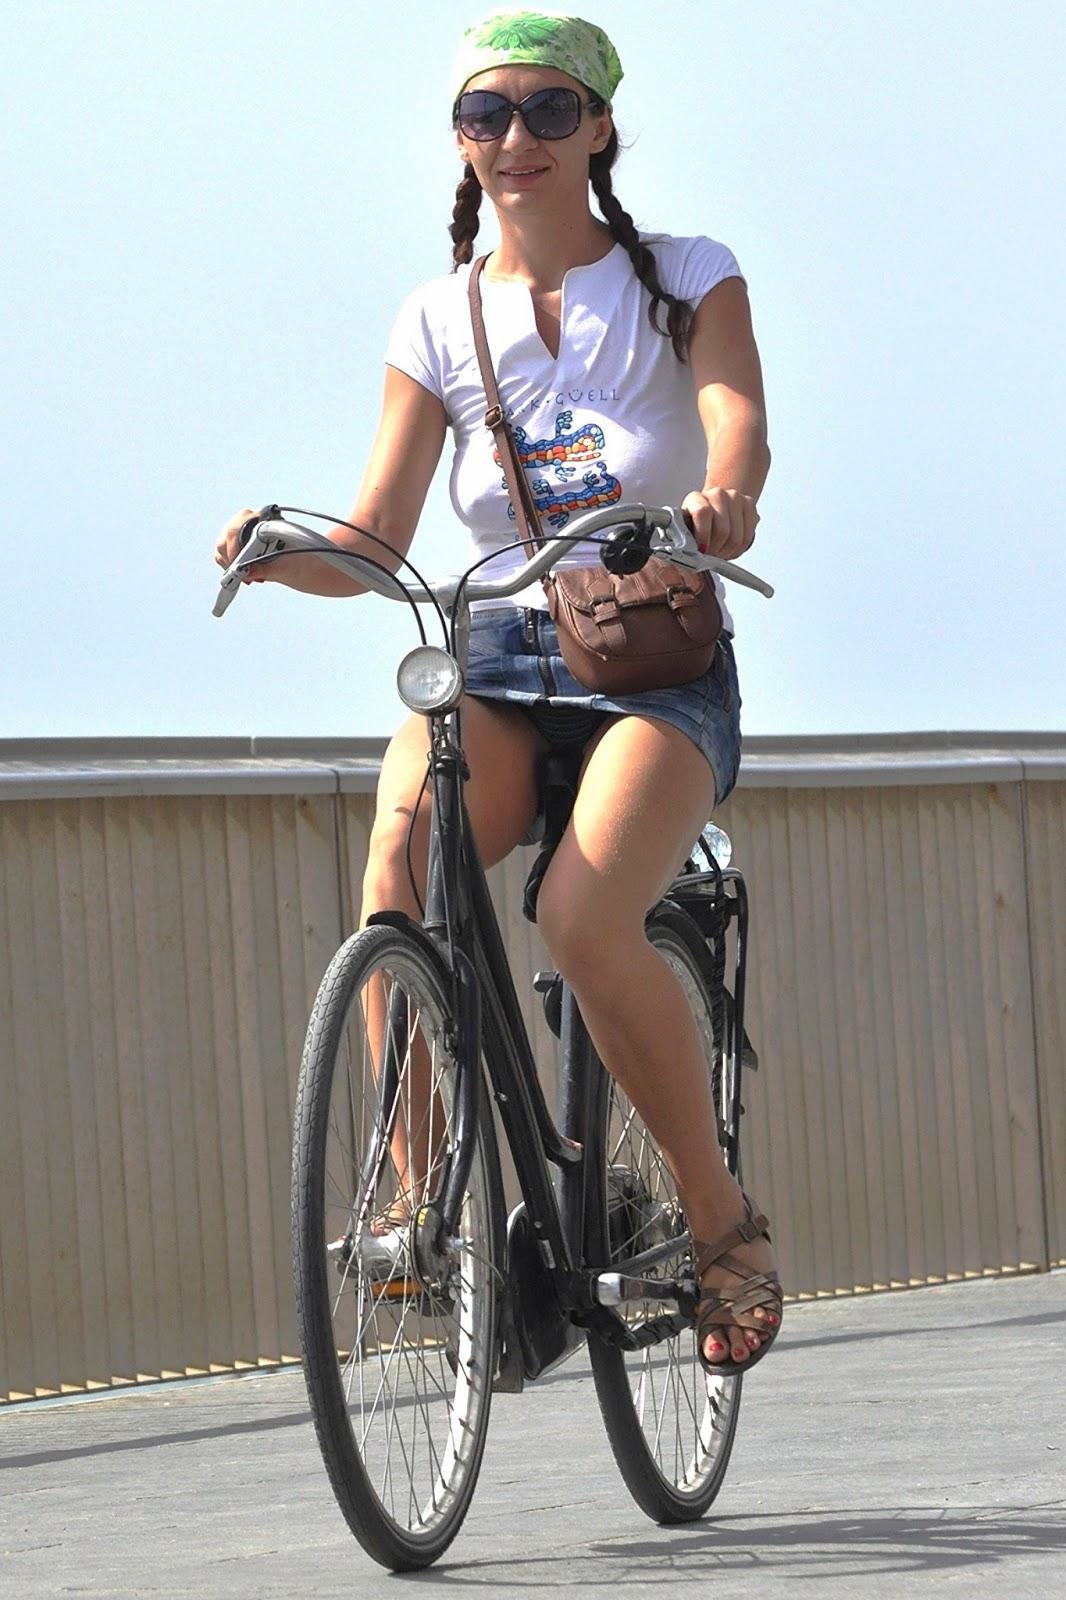 Upskirt on bike